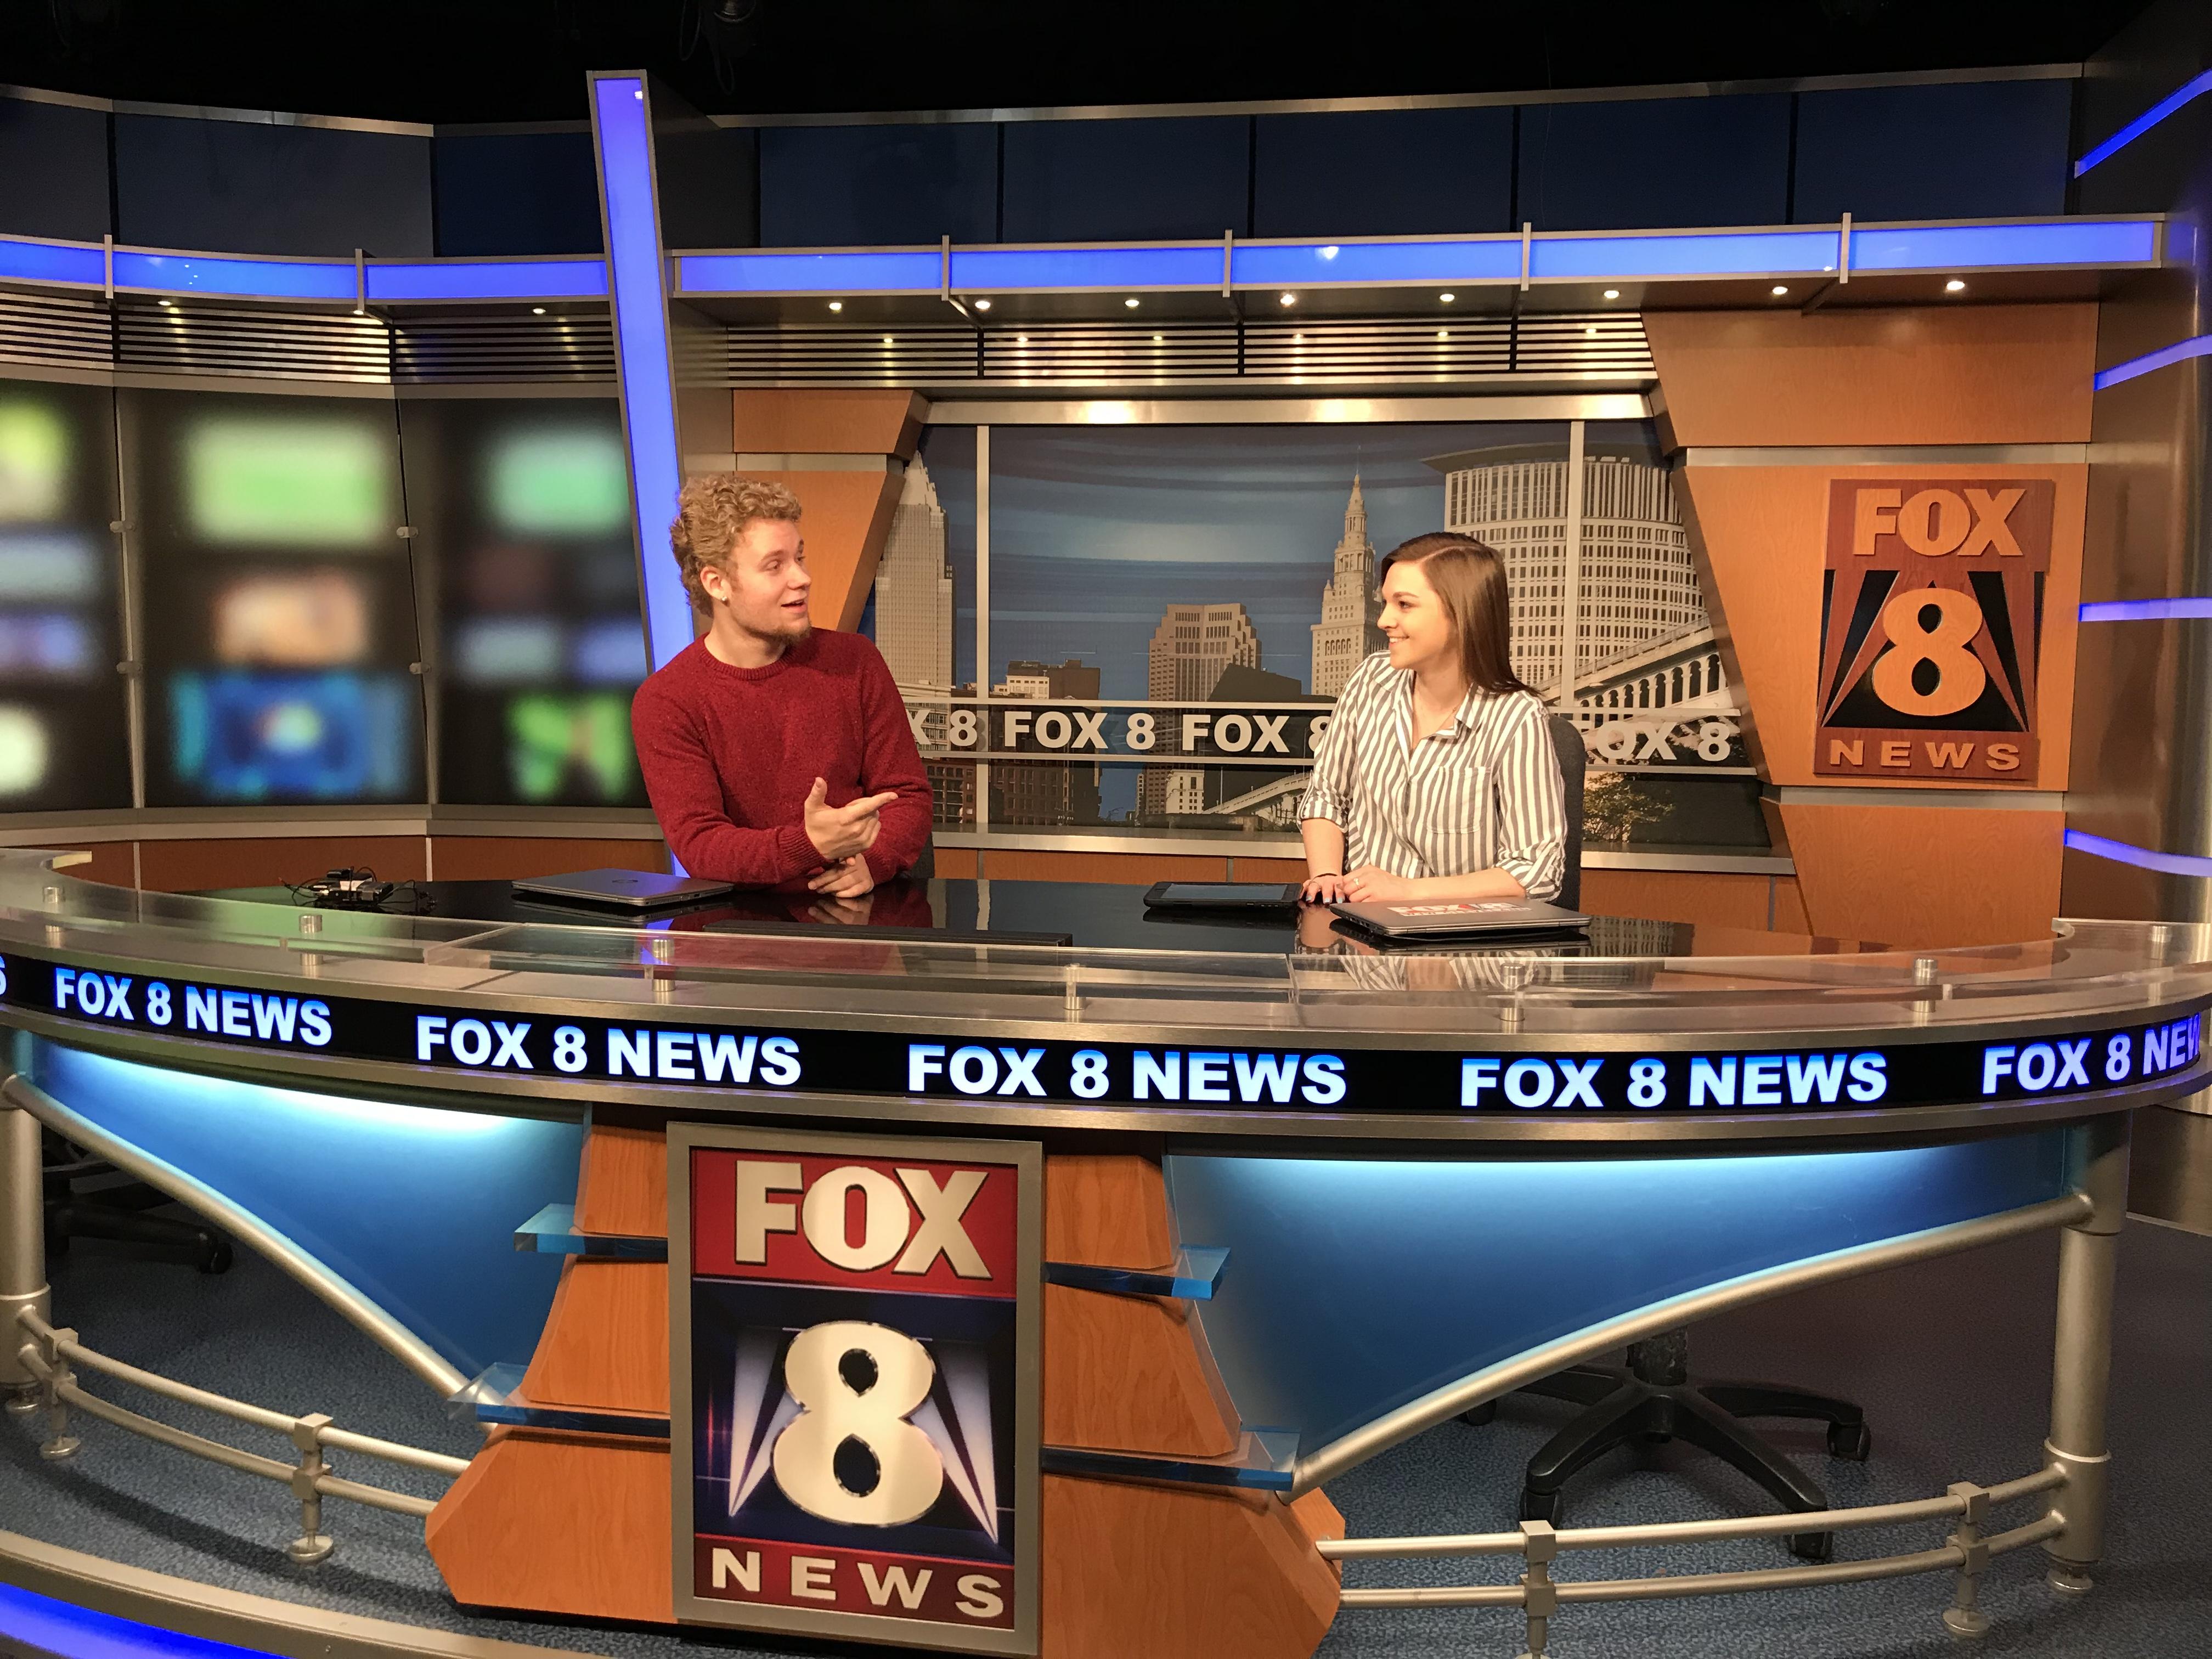 Behind the scenes of Fox 8 News